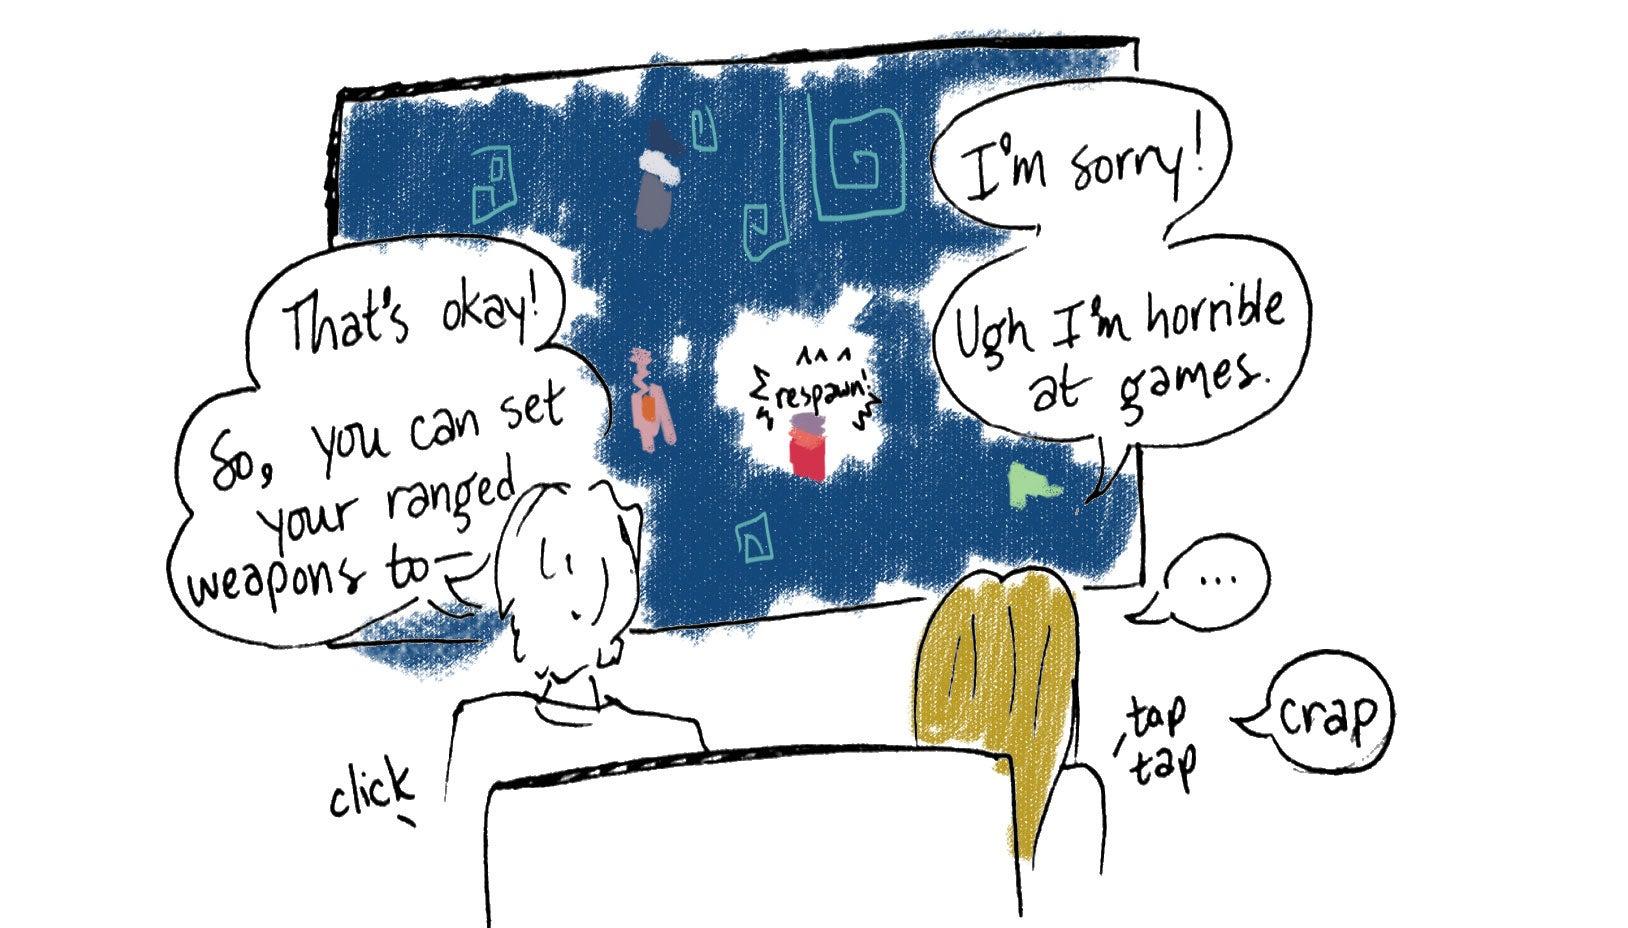 E3 Comic #3: Crap, I'm Sorry!